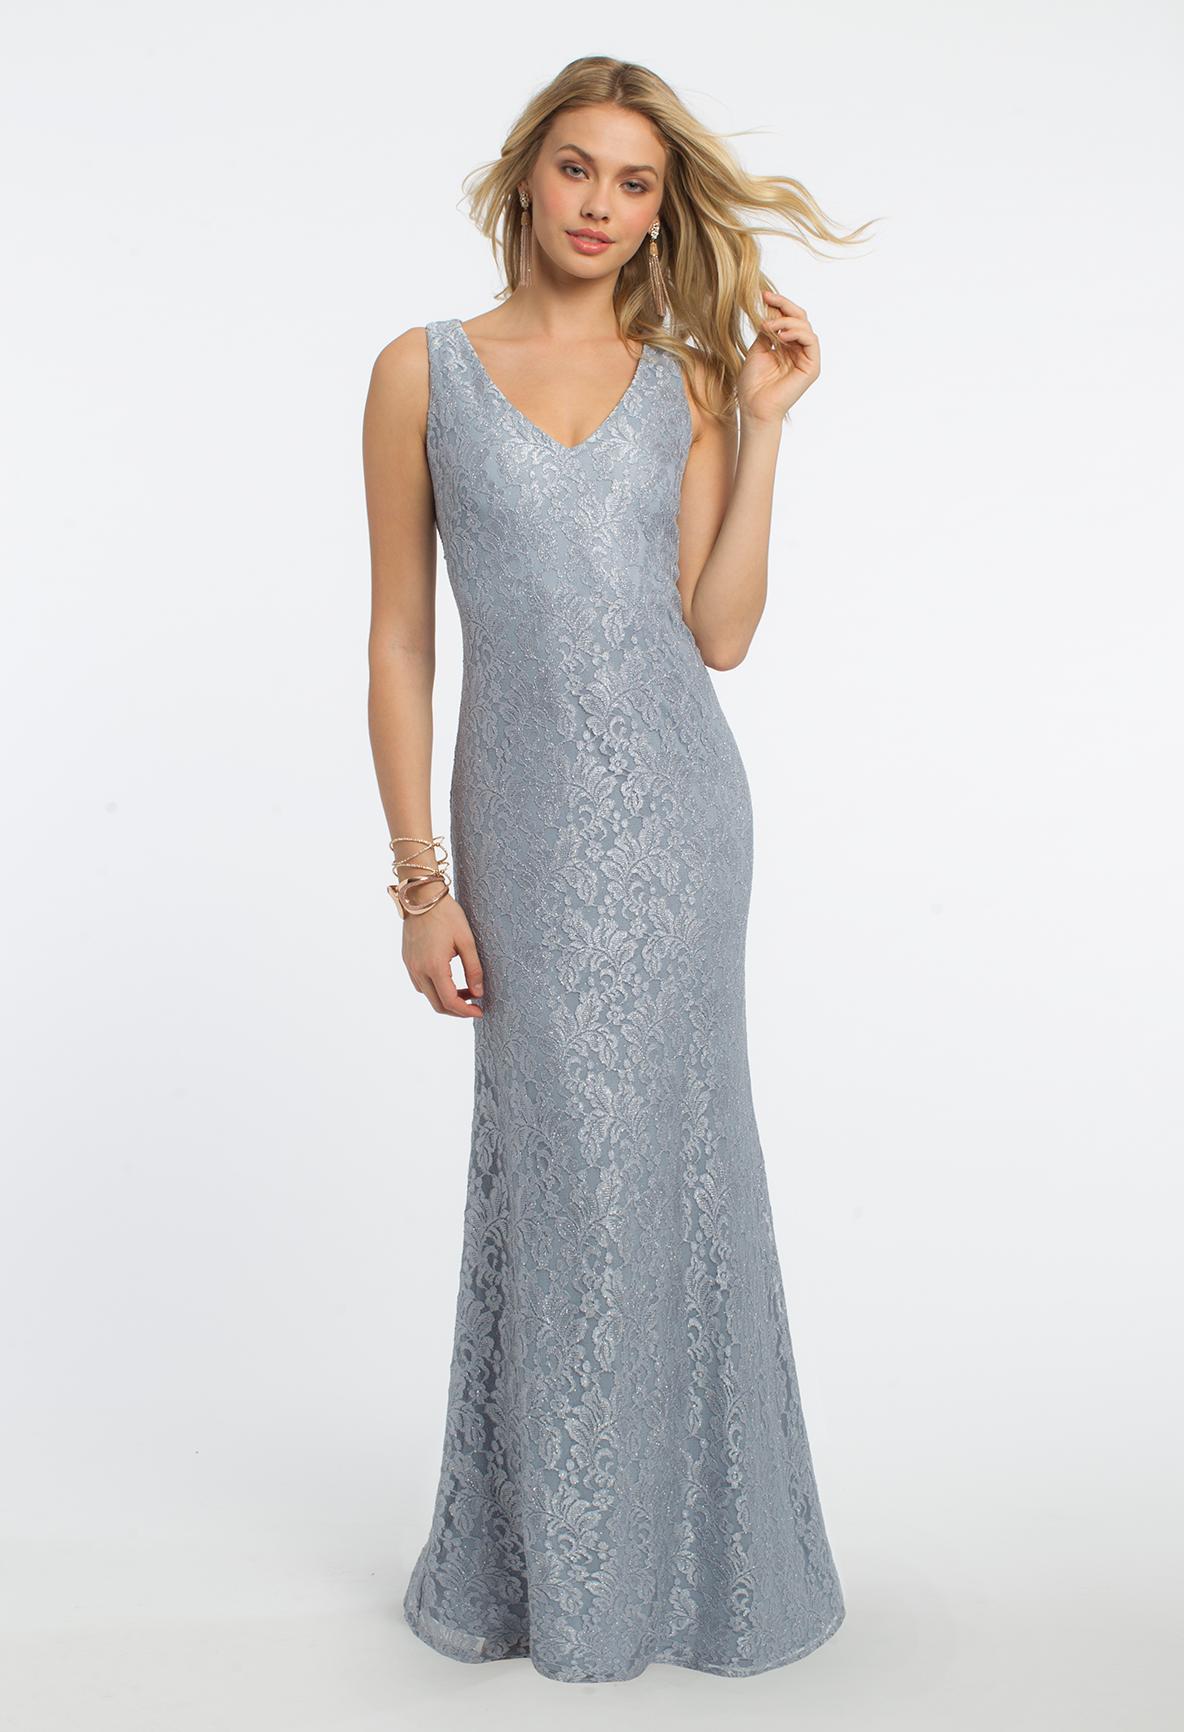 Beaded Trim Cape Lace Dress #camillelavie